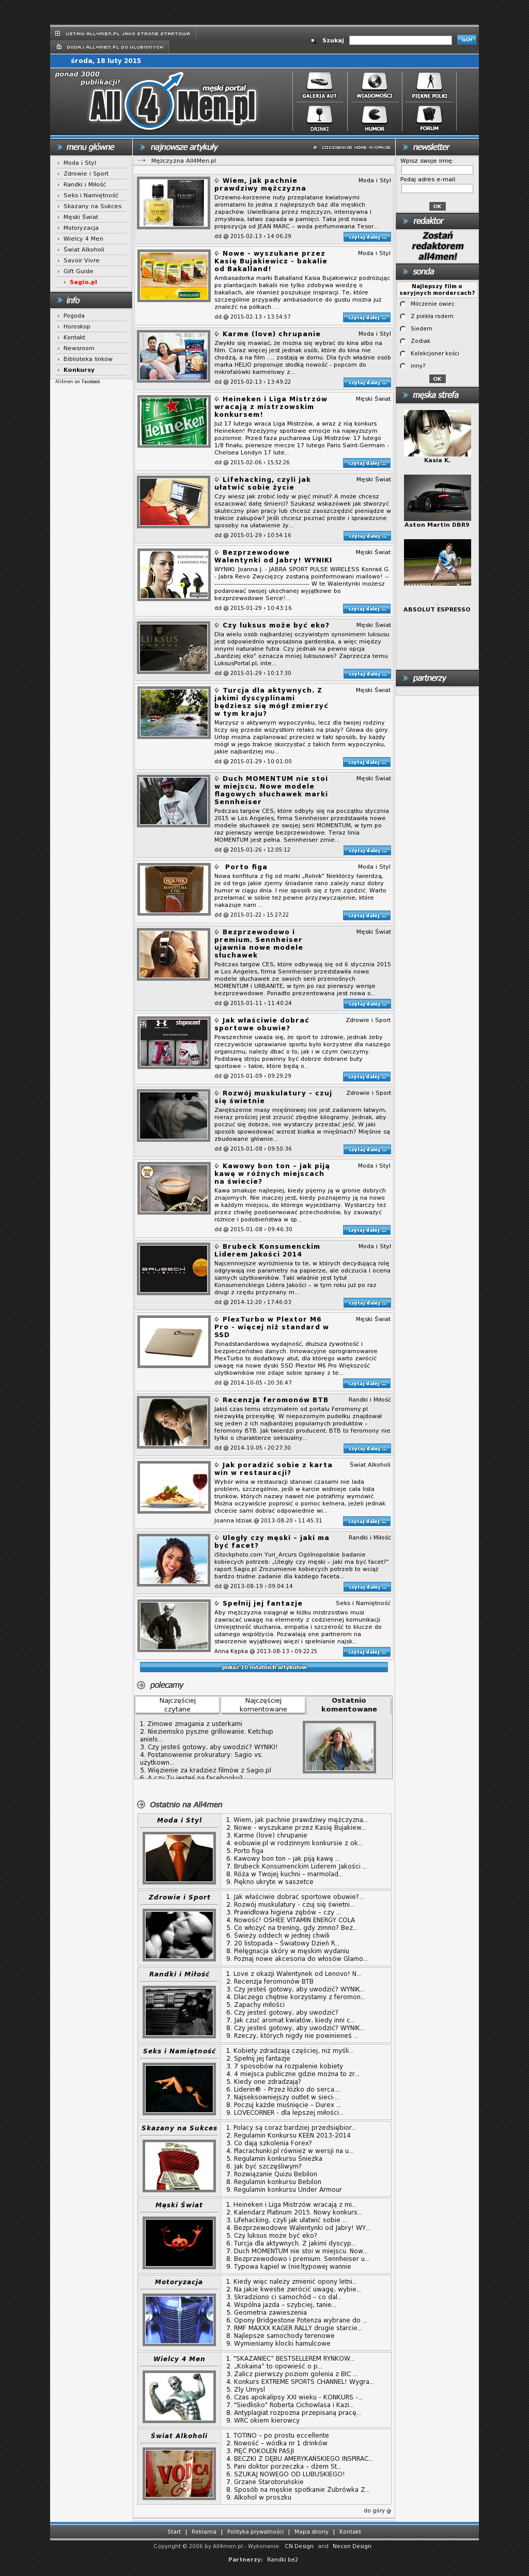 innovative design 5a7a7 72f37 All4men Competitors, Revenue and Employees - Owler Company Profile